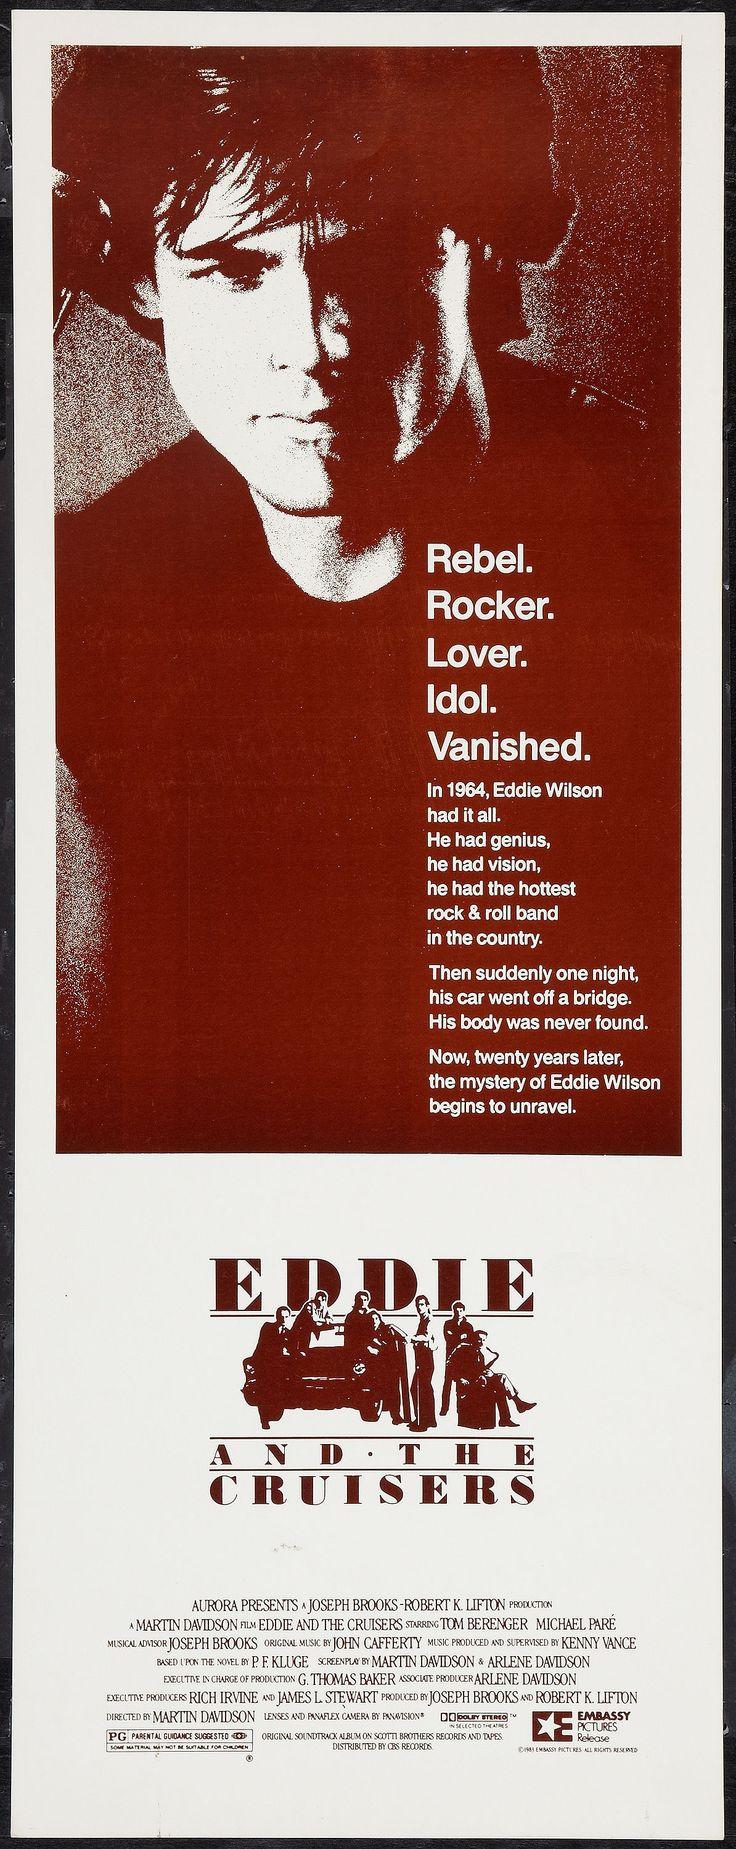 Eddie and the Cruisers (1983) Stars: Tom Berenger, Michael Paré, Joe Pantoliano, Matthew Laurance, John Stockwell, Ellen Barkin ~ Director: Martin Davidson